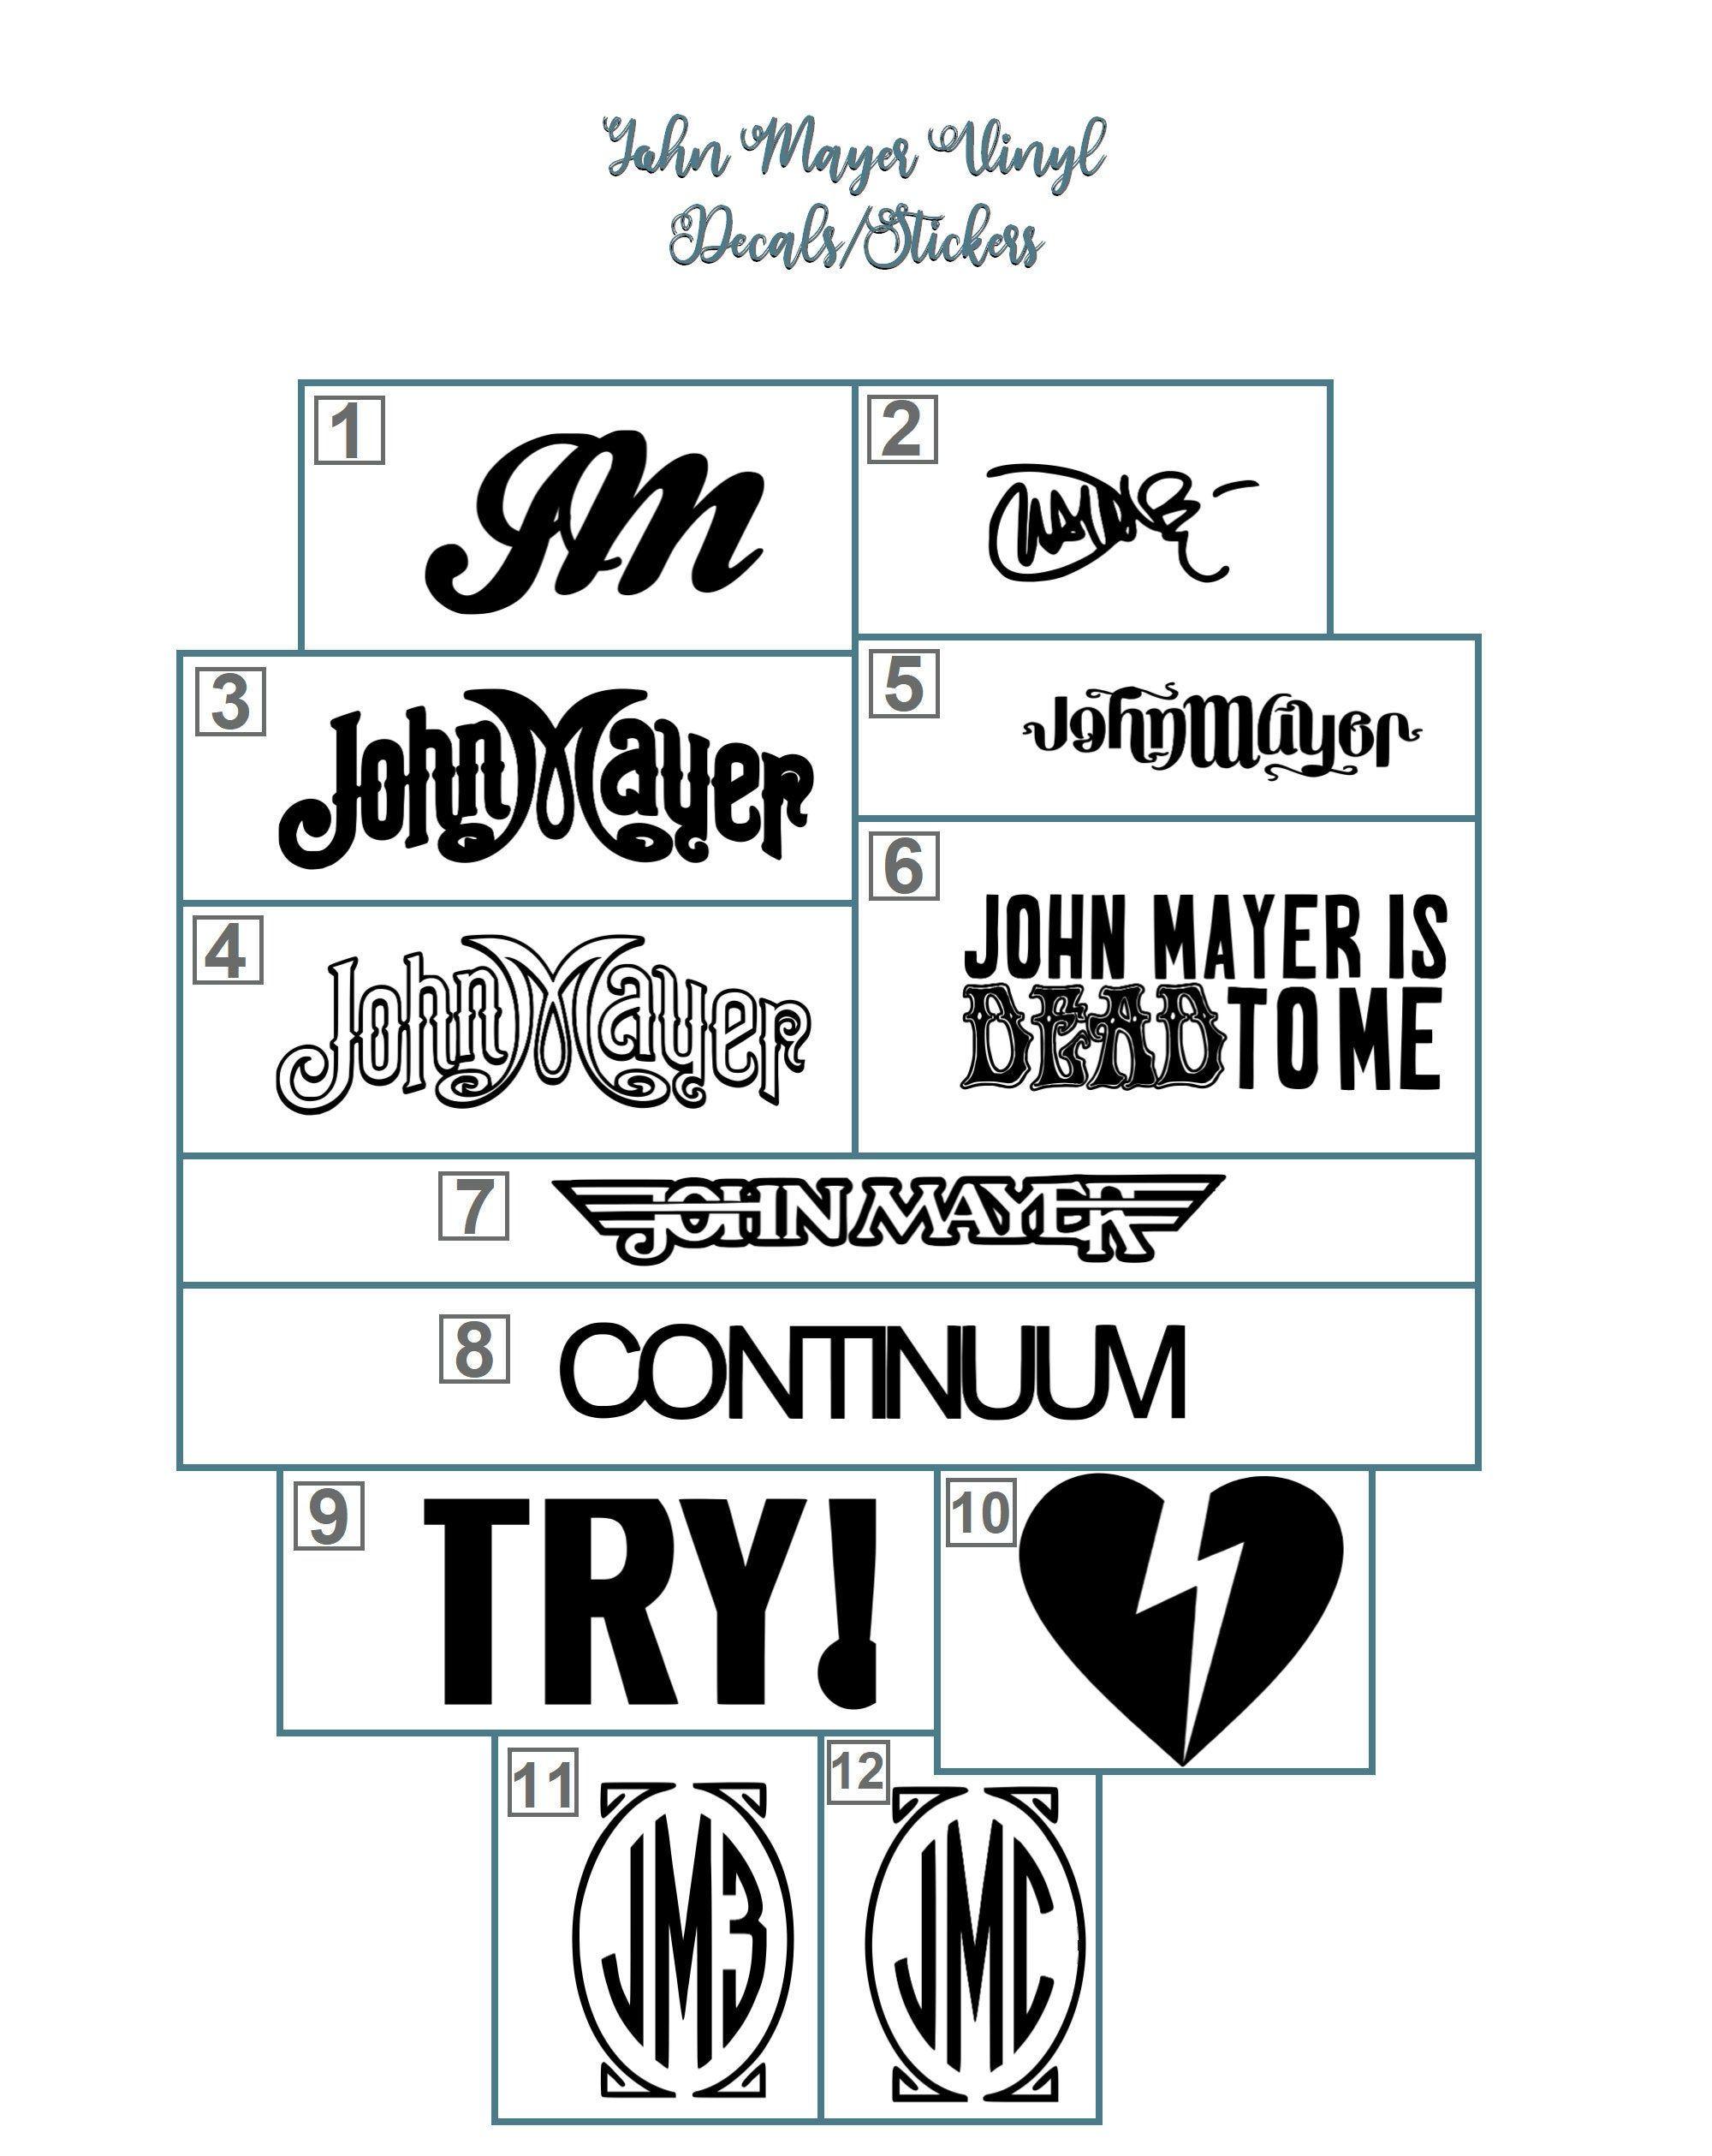 John Mayer Vinyl Decals Stickers For Car Laptop Tumbler John Mayer Trio Dead Co Continuum John Mayer Tattoo John Mayer John Mayer Trio [ 2518 x 2000 Pixel ]